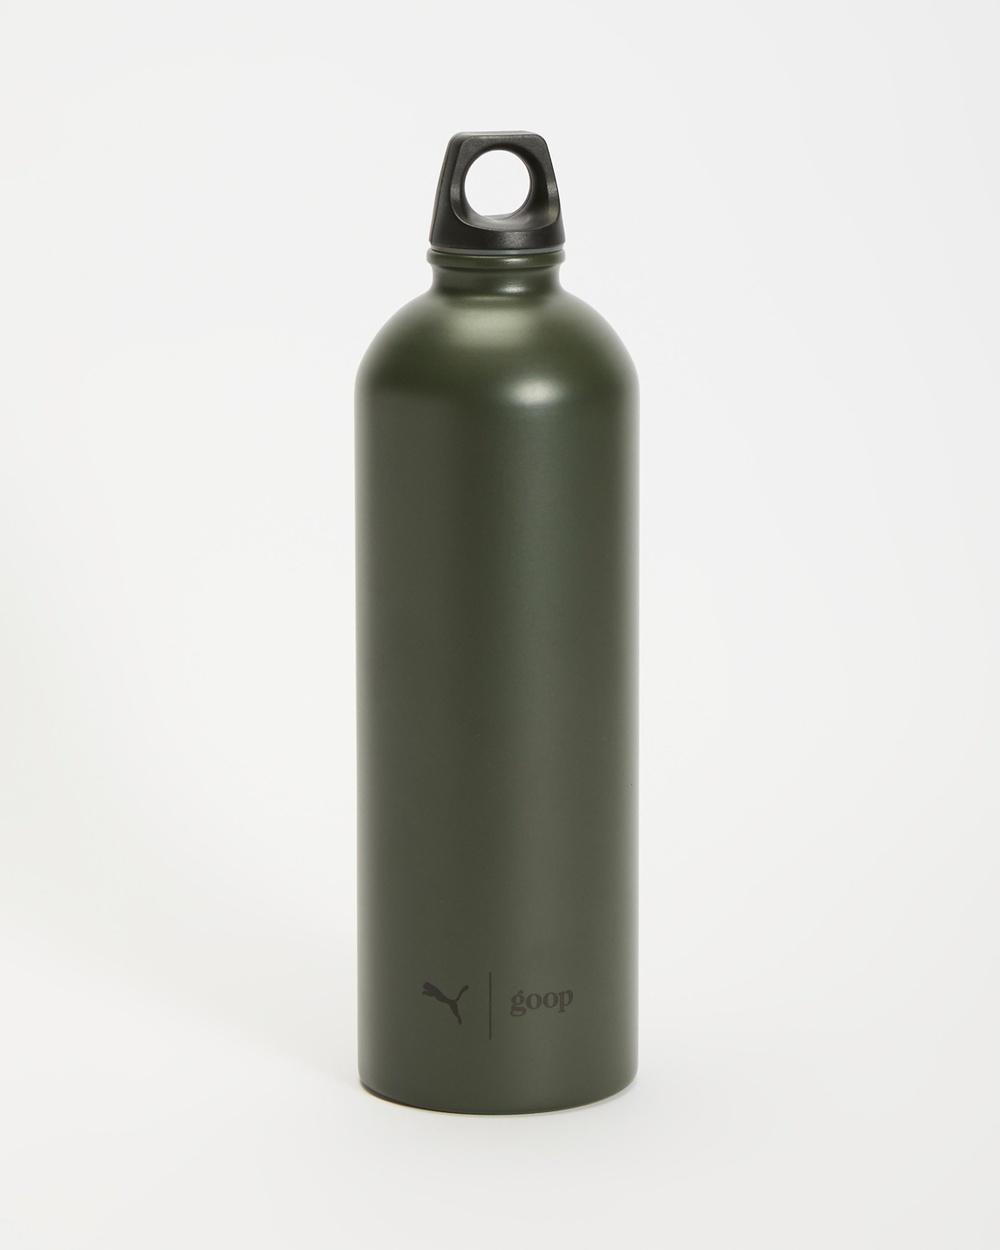 Puma Goop Stainless Steel Bottle Drink Bottles Grape Leaf